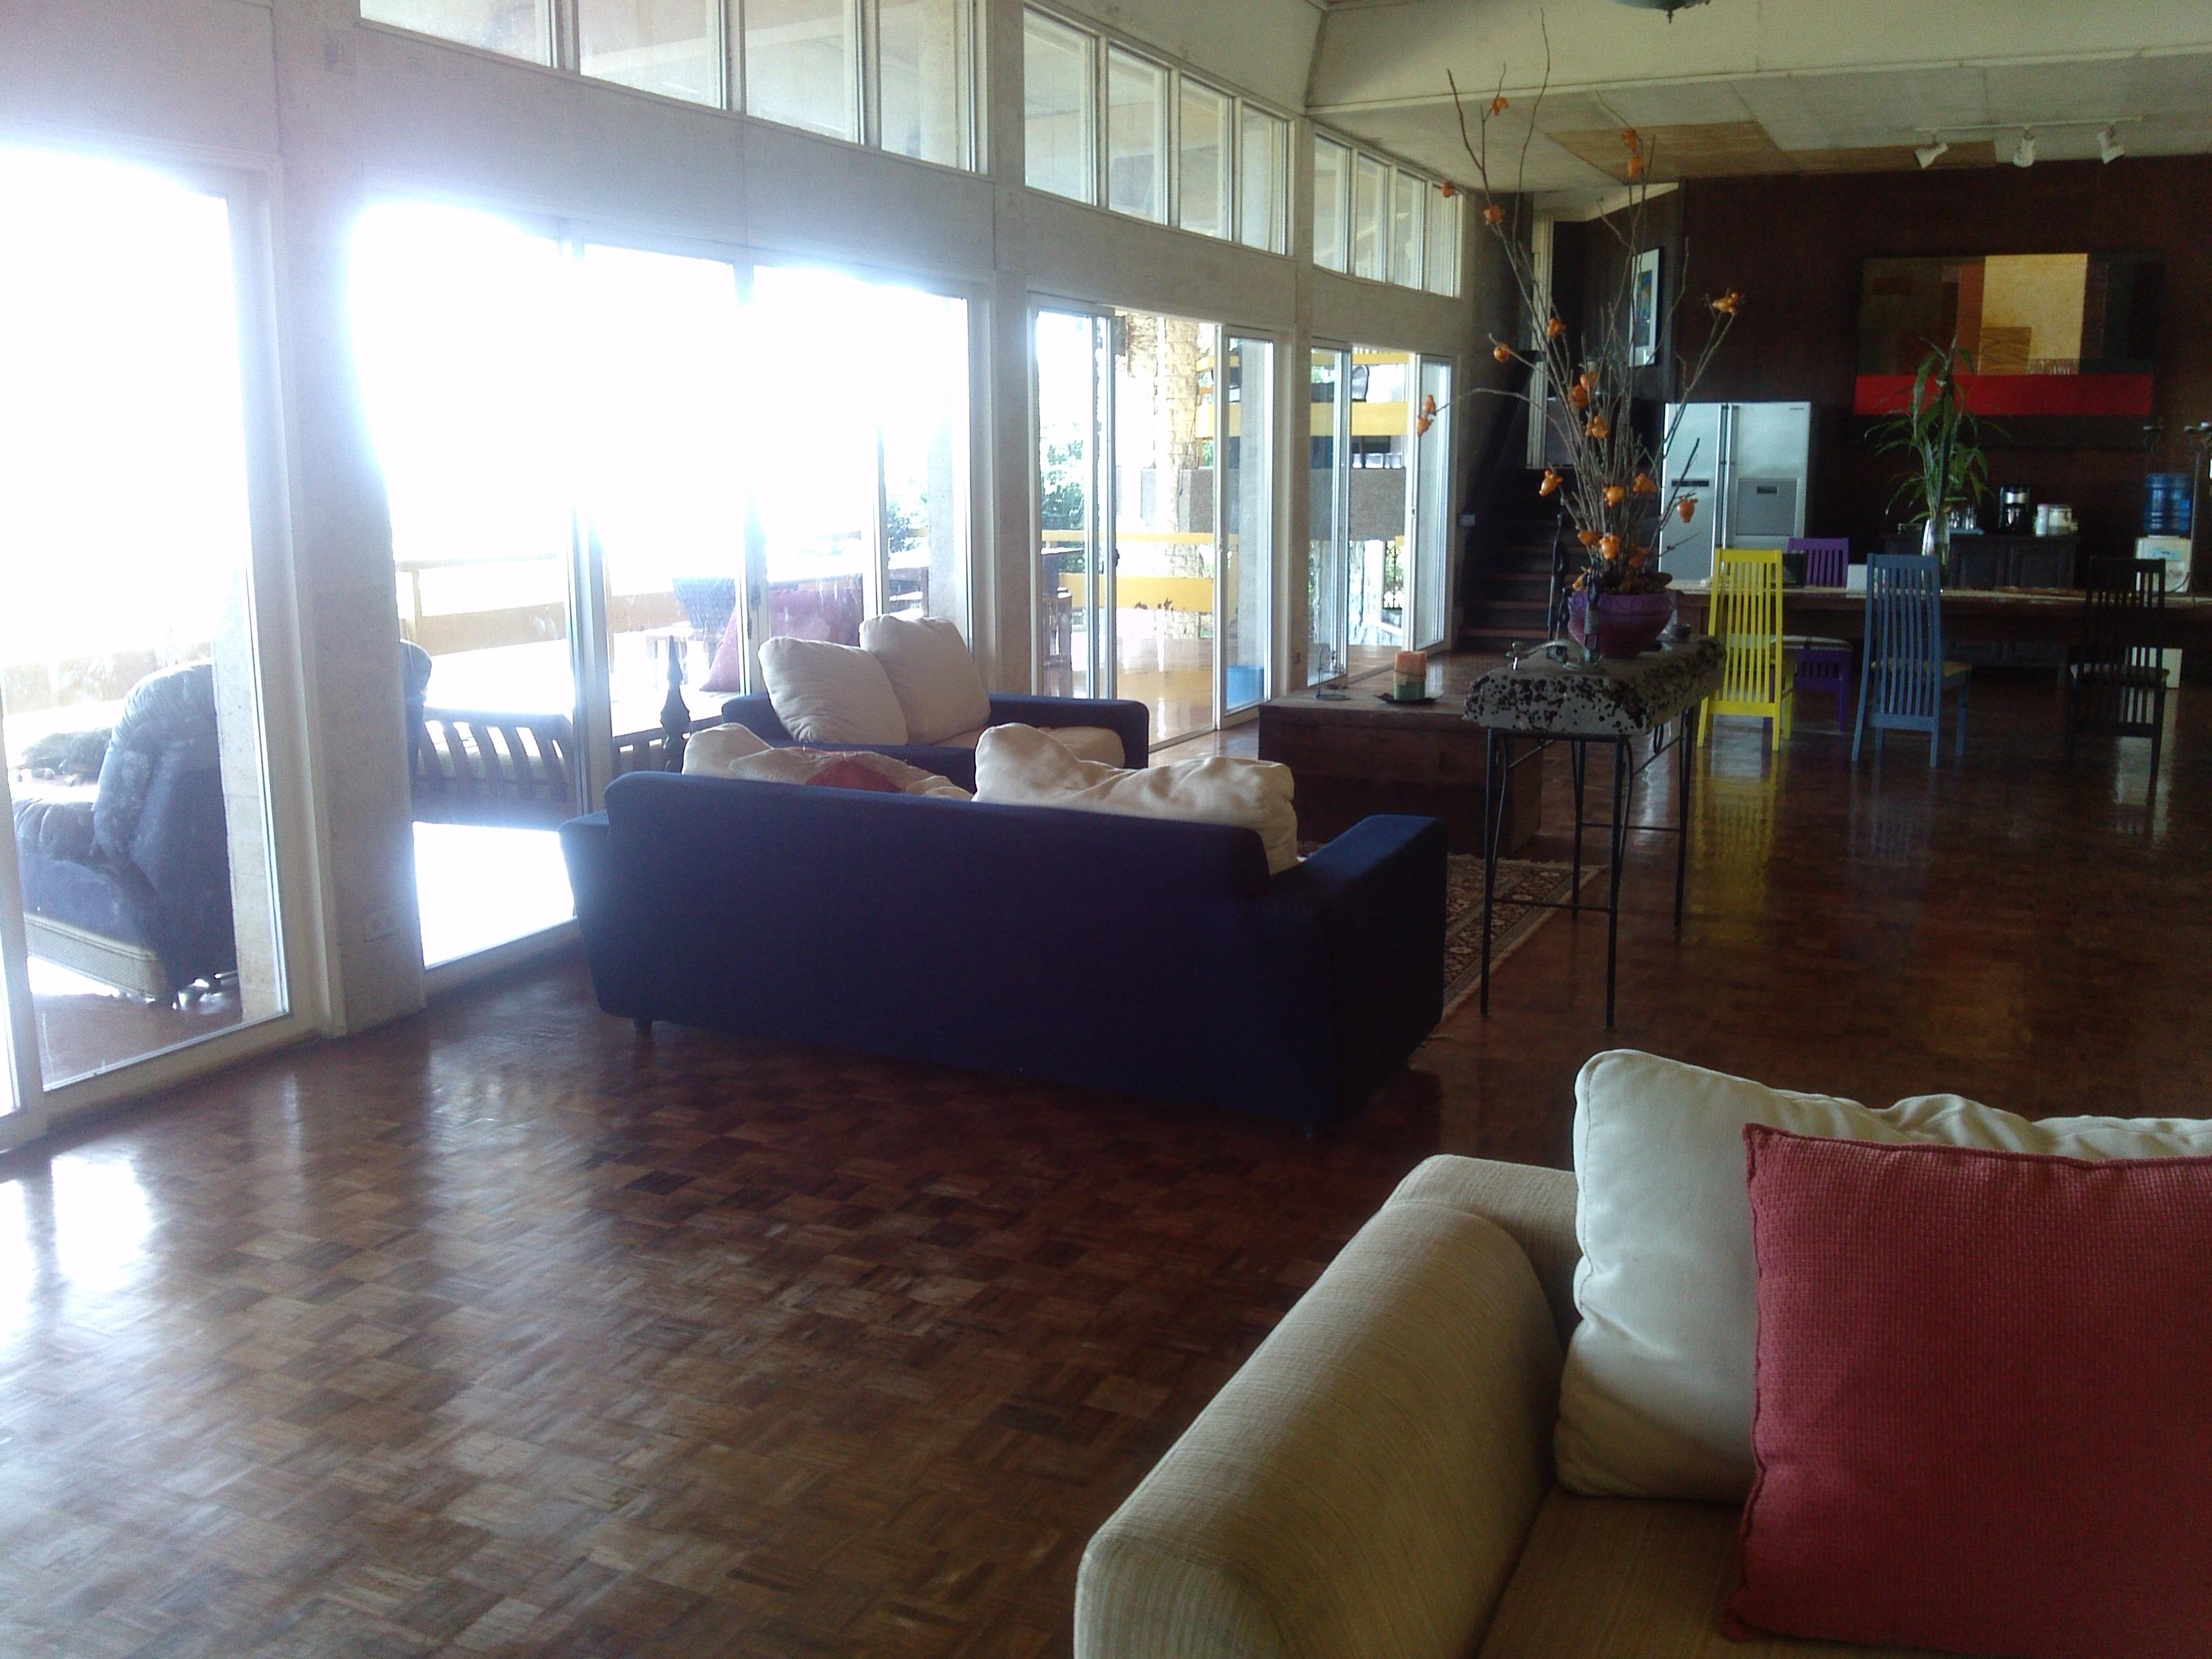 The Malasag House interior